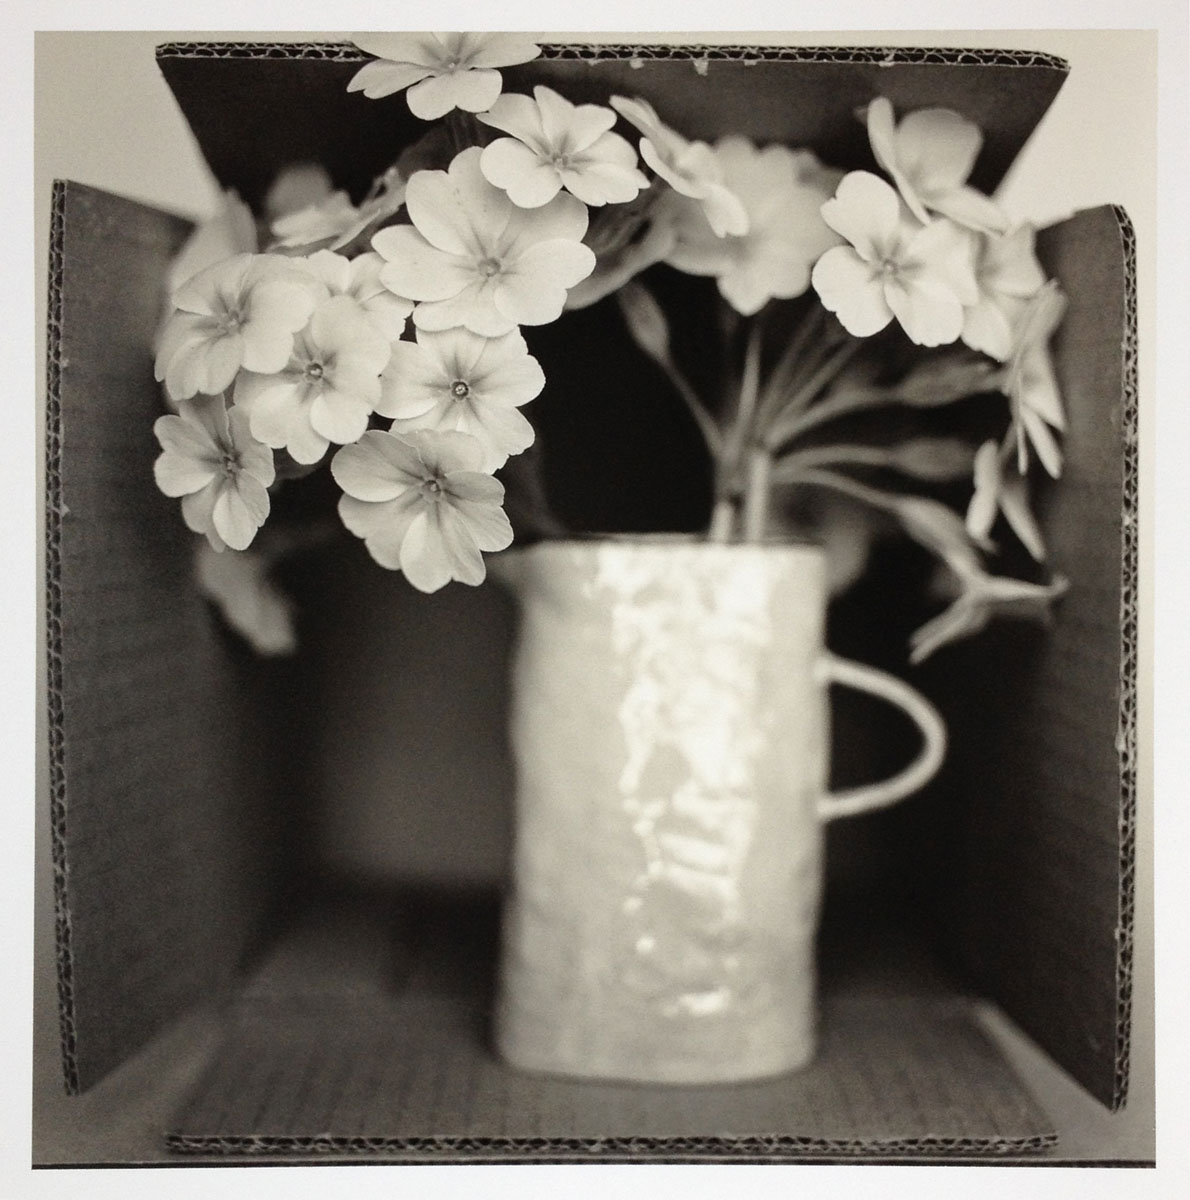 Still life - Flowers in a cardboard box